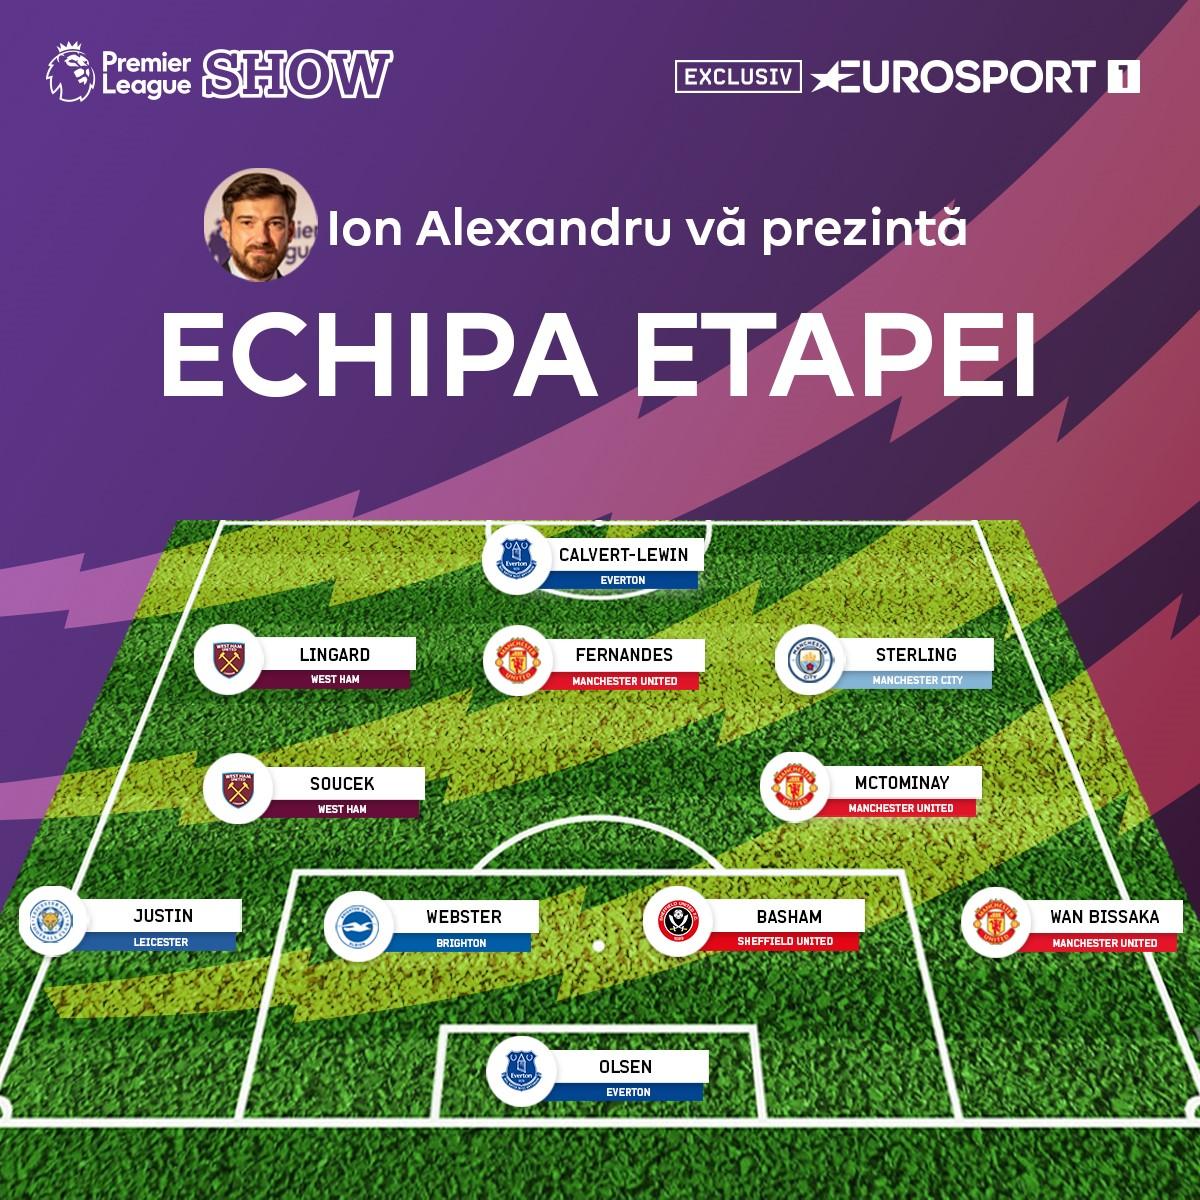 https://i.eurosport.com/2021/02/05/2985399.jpg